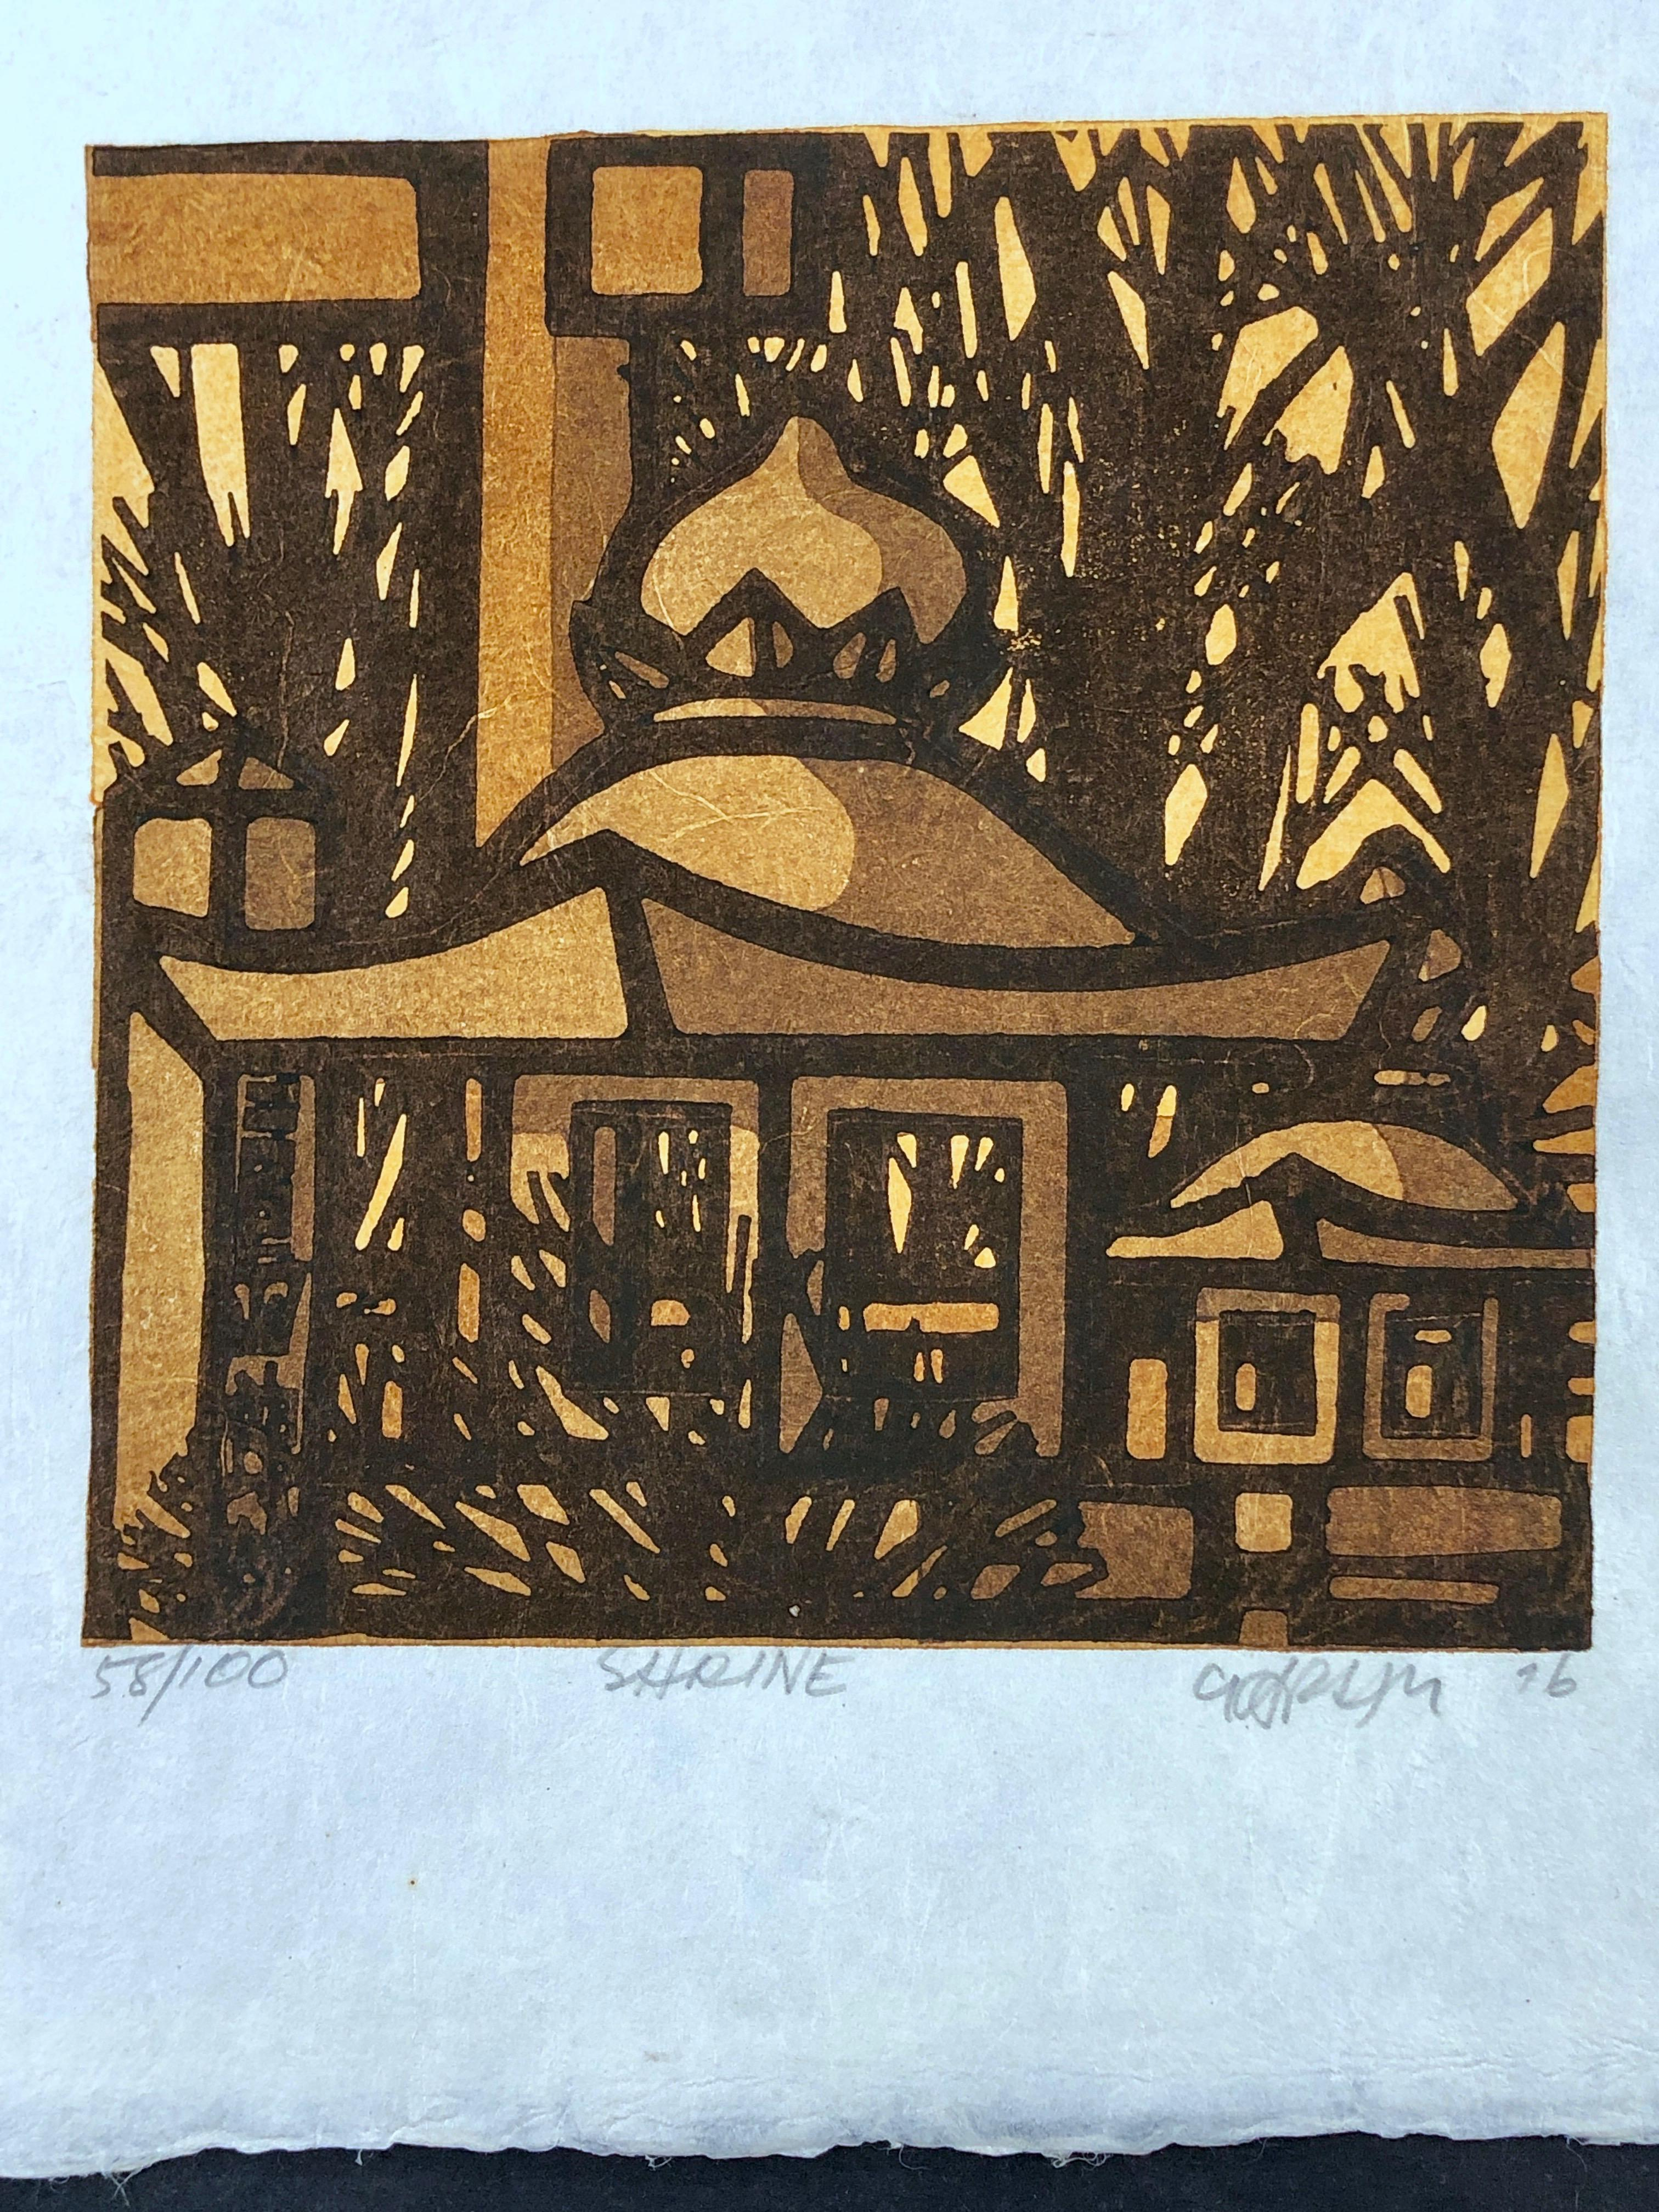 Shrine, wood block print, Japan, yellow, brown, black, graphic, Karhu